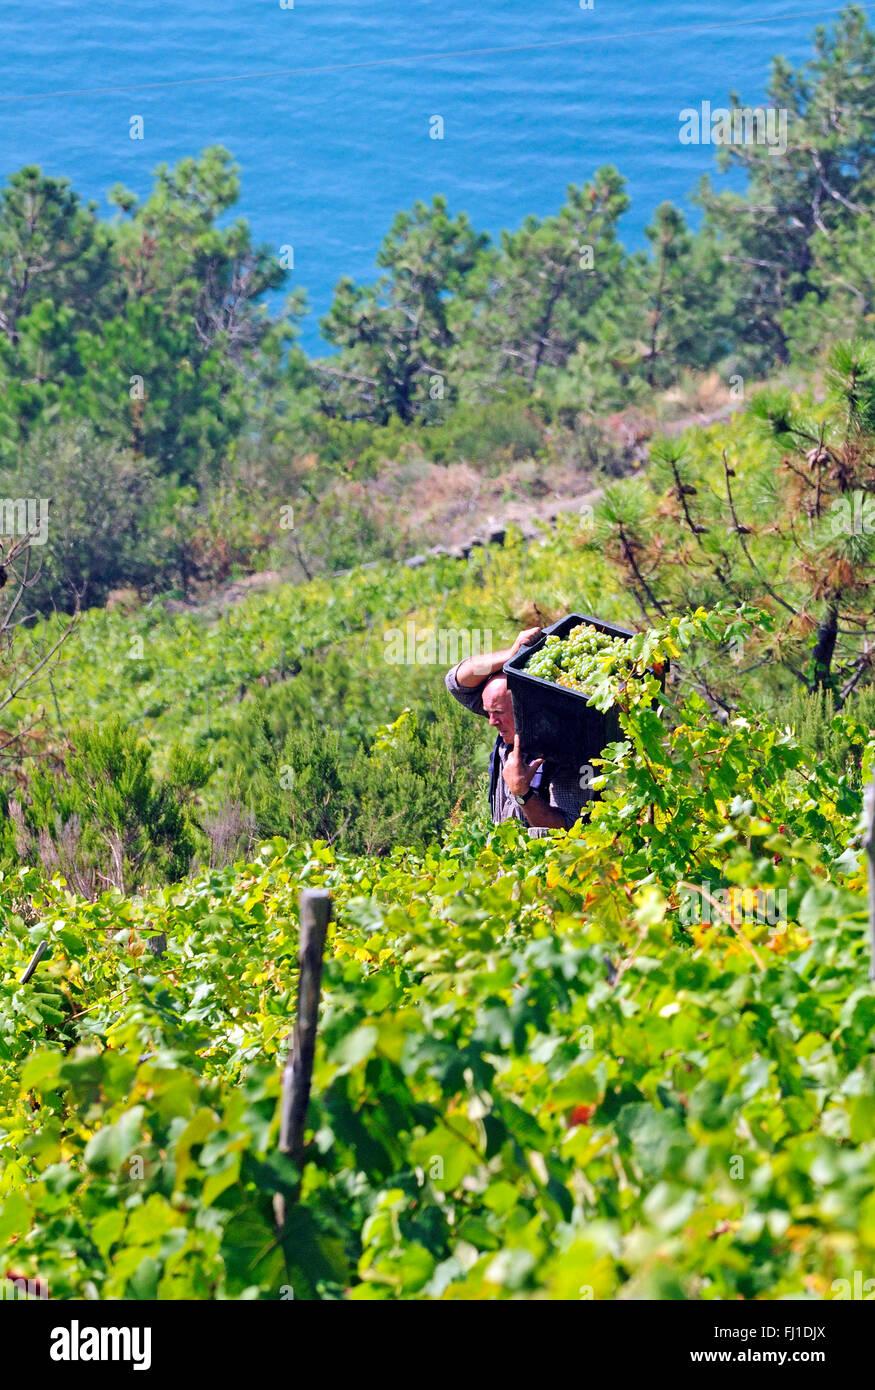 A vineyard overlooks the coast on the cliffs of the Mediterranean along the Italian Riviera, Corniglia - Stock Image